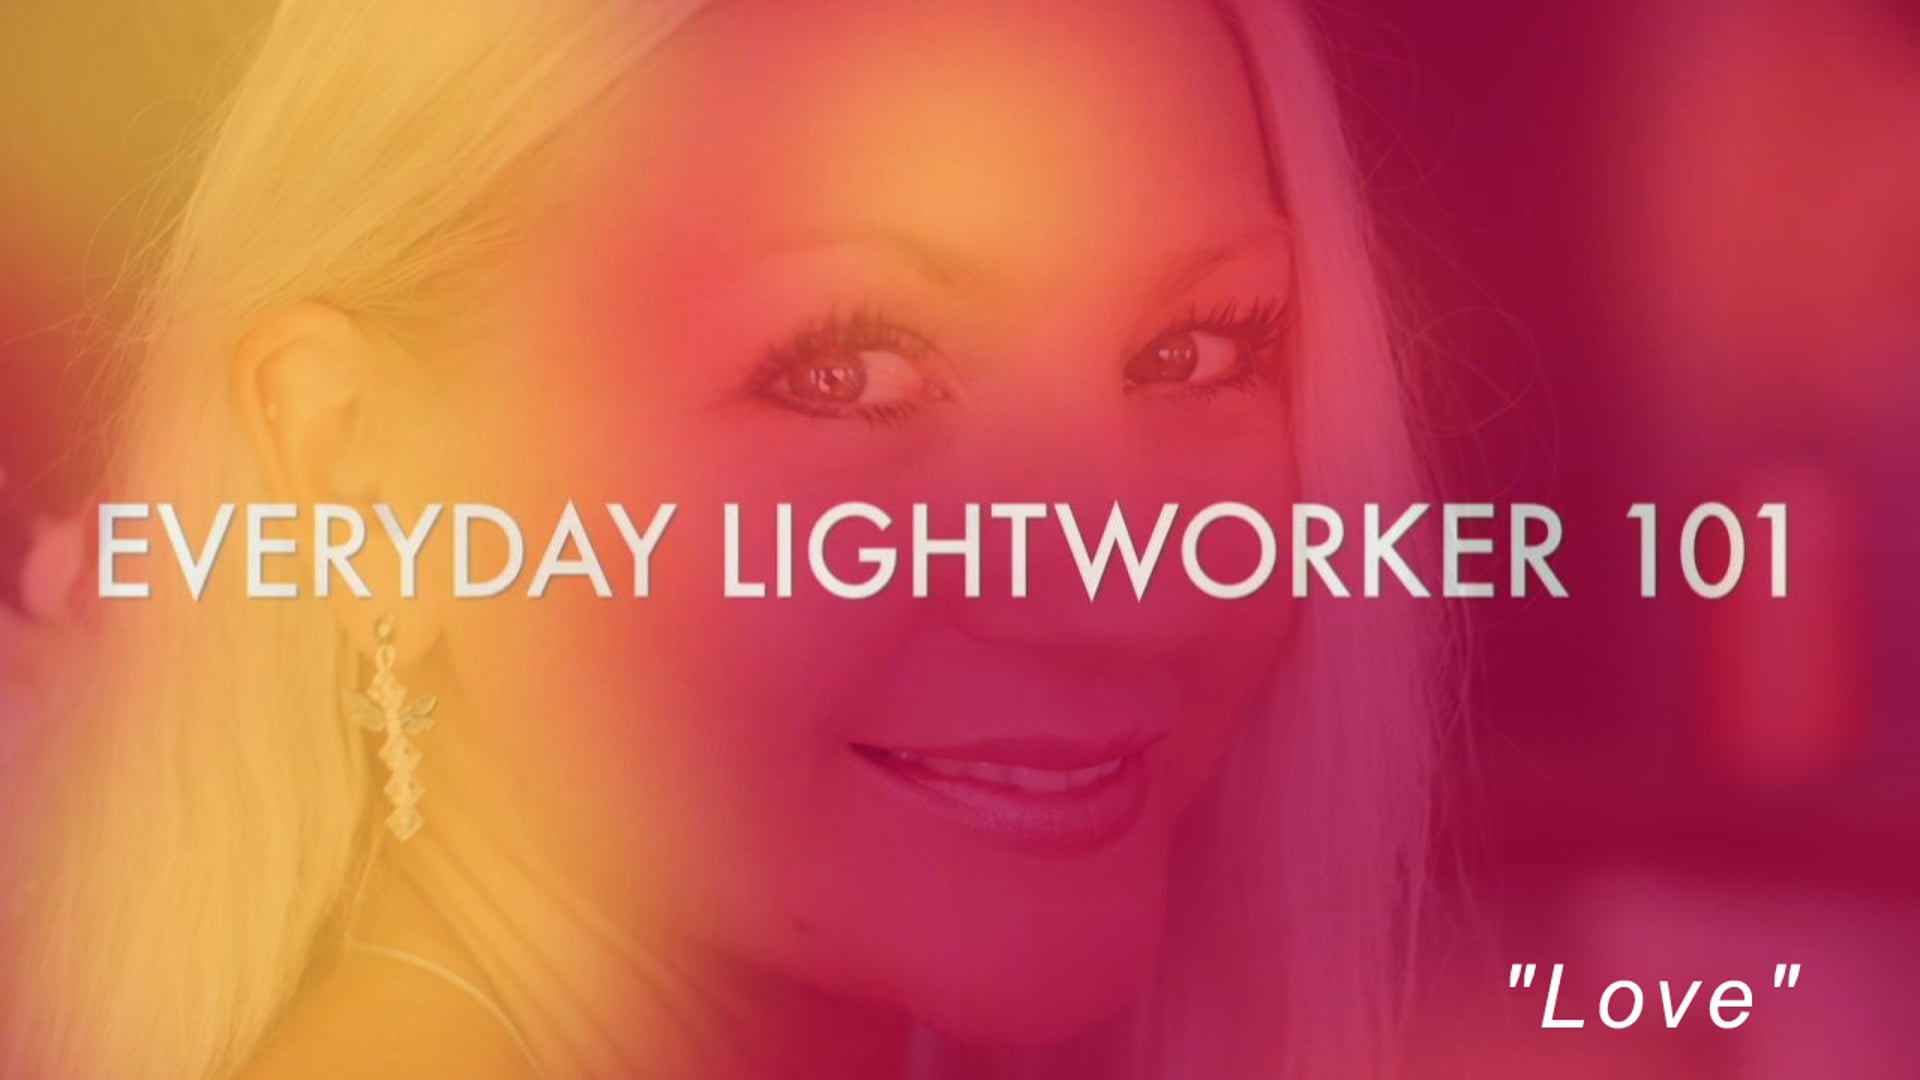 Everyday Lightworker 101: Love